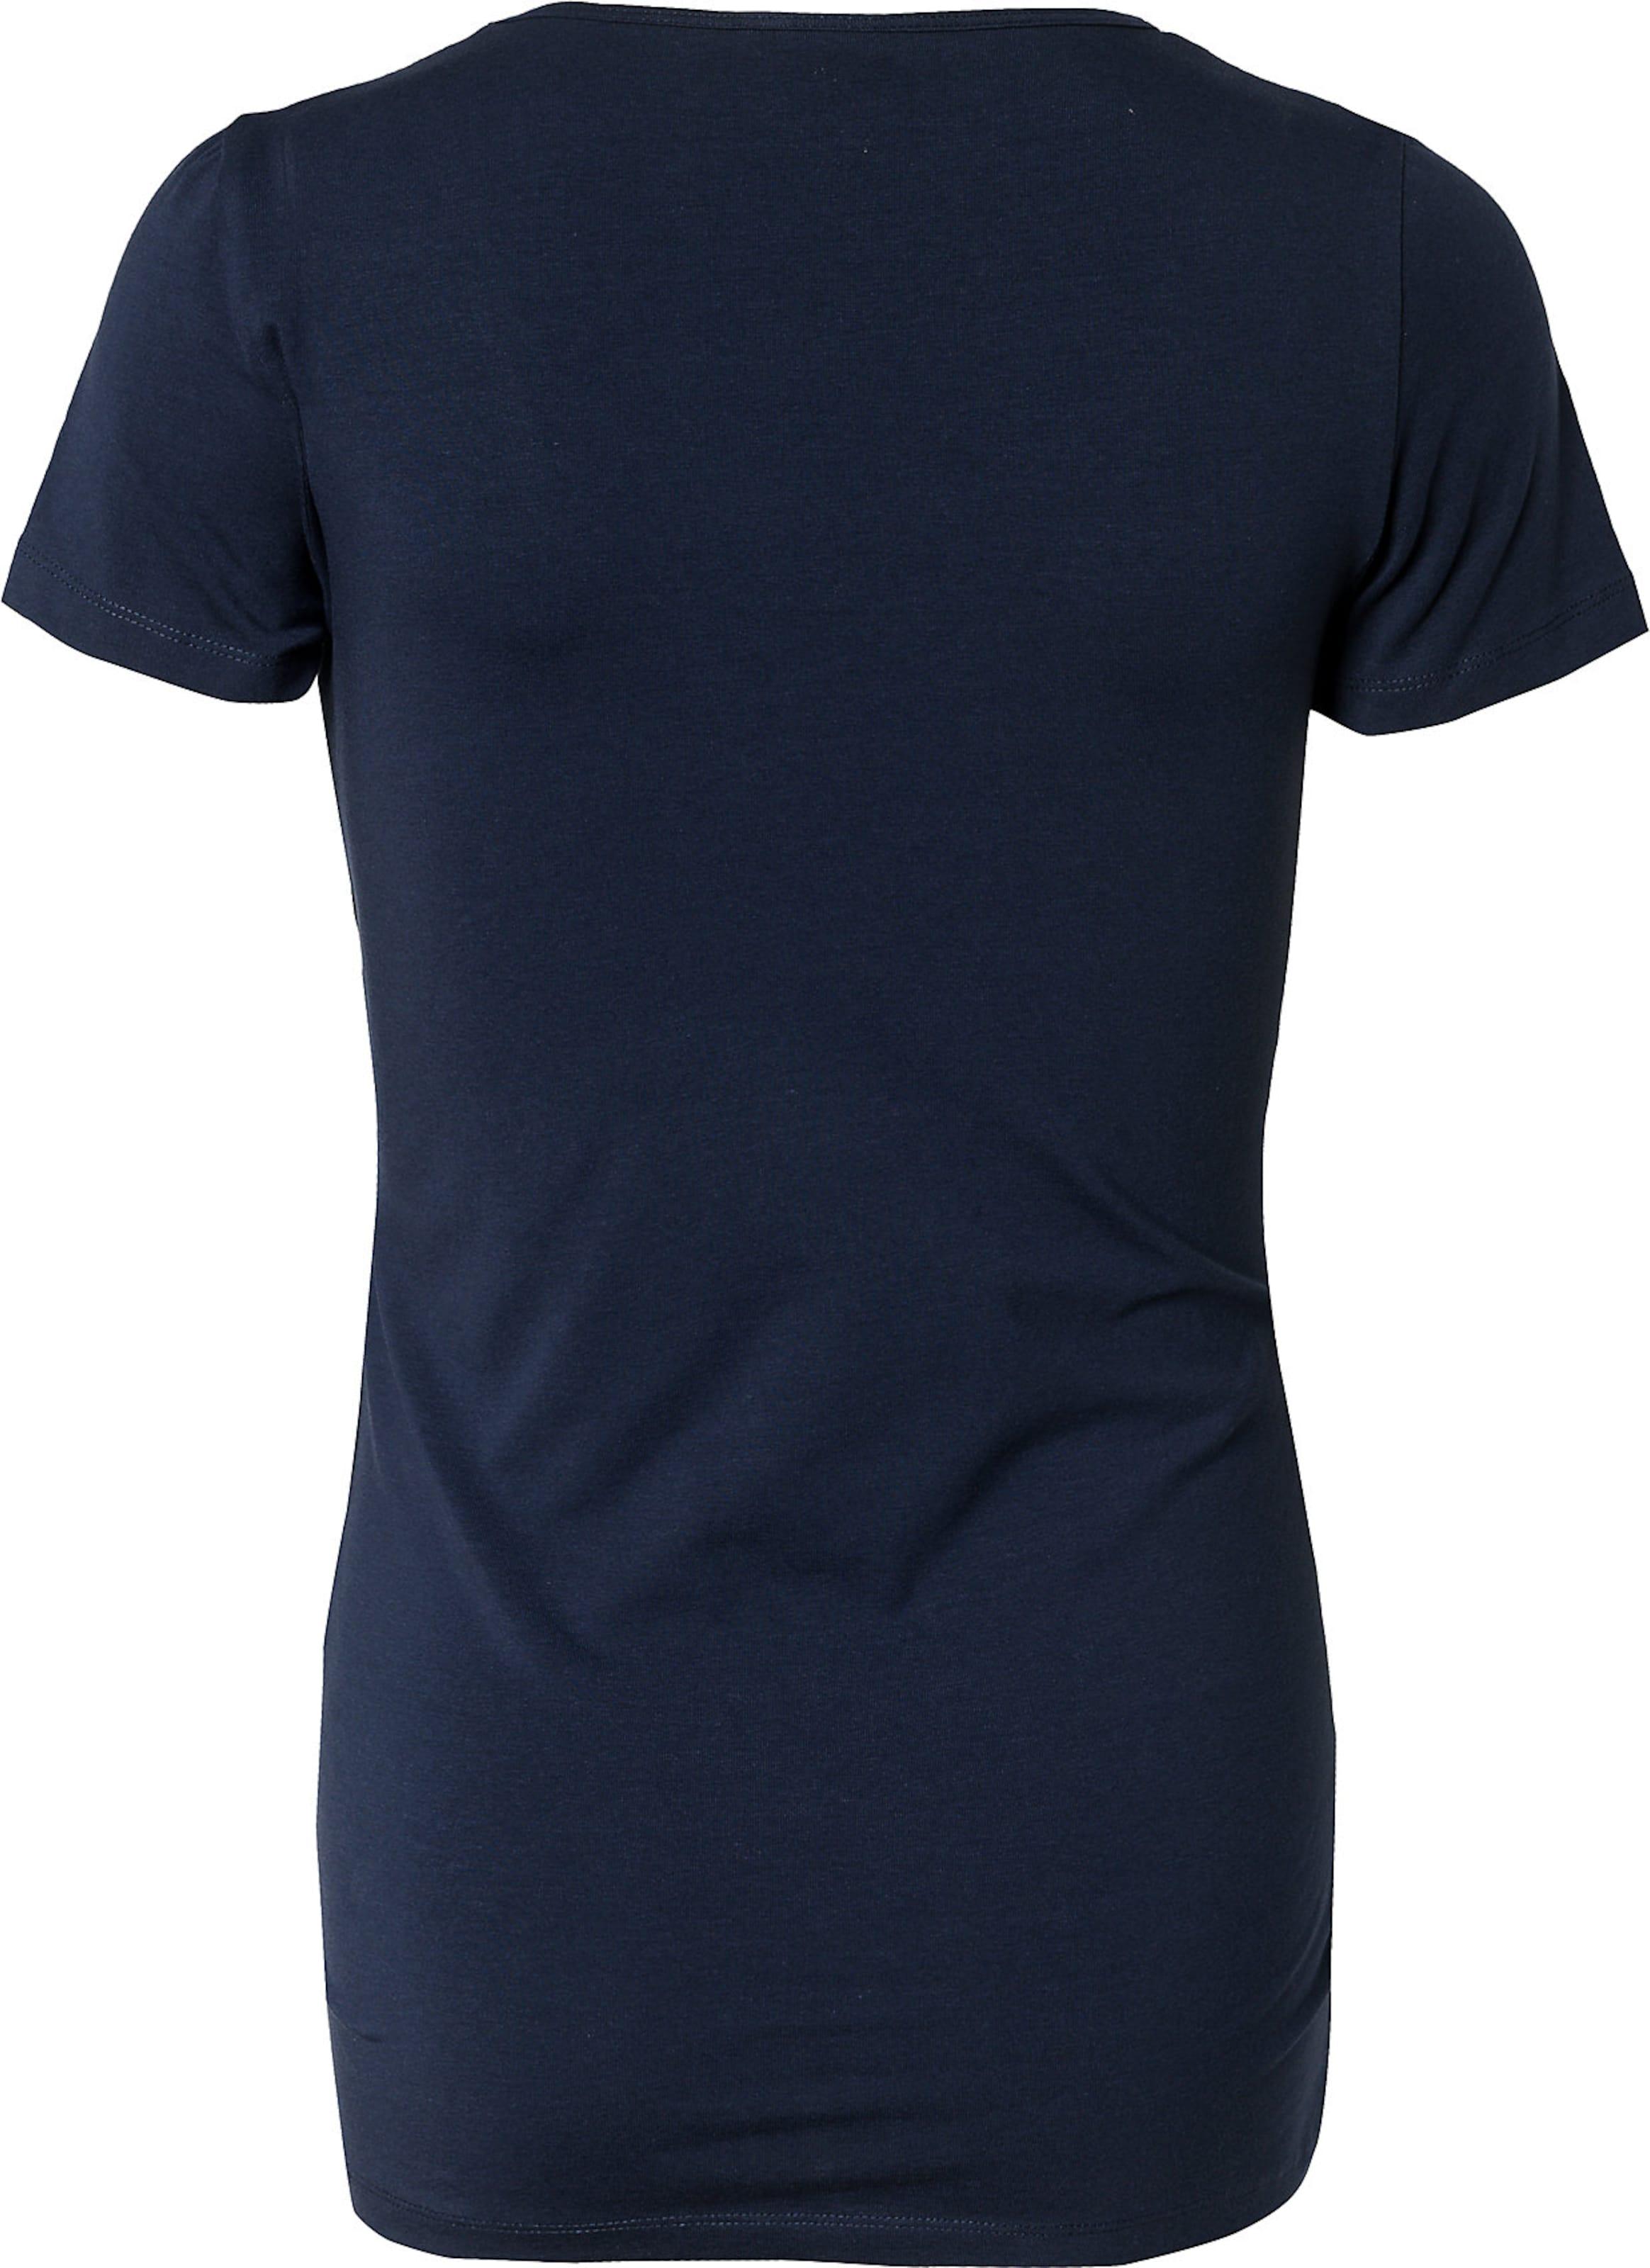 shirt En Mamalicious T Bleu 'lea' Nuit IvYymbf76g